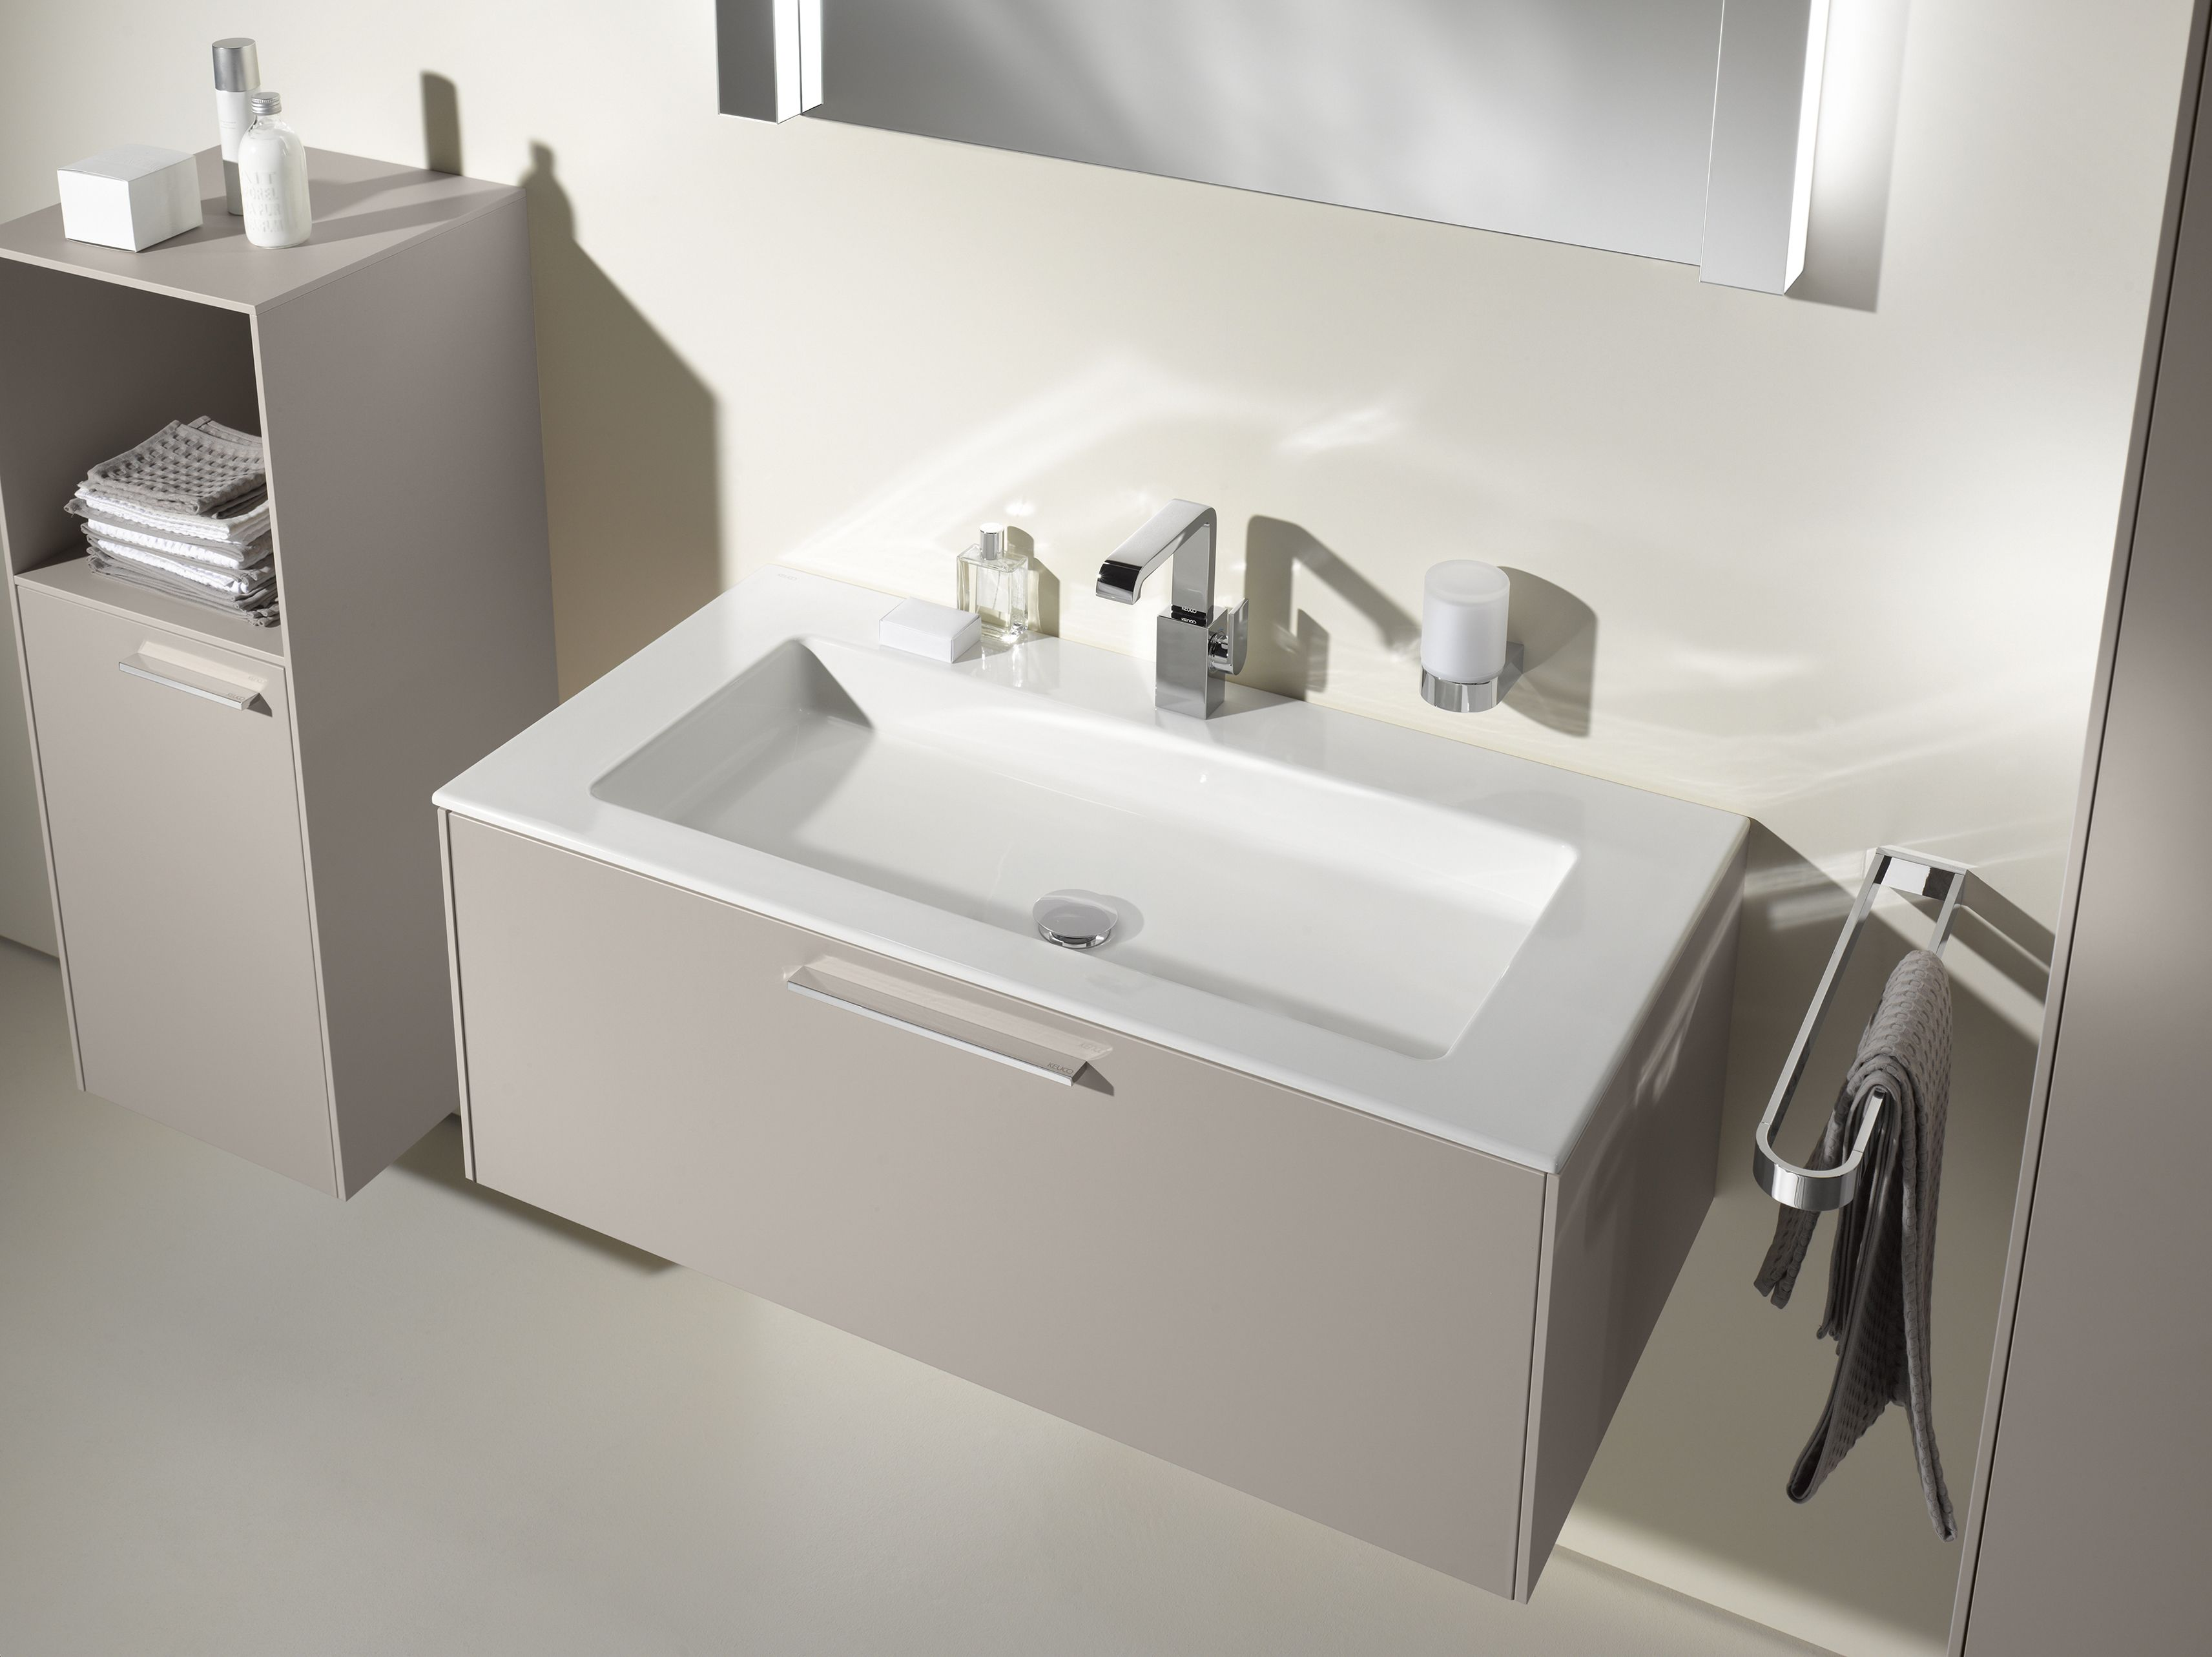 KEUCO ROYAL 60 BathroomFurniture Architecture Design